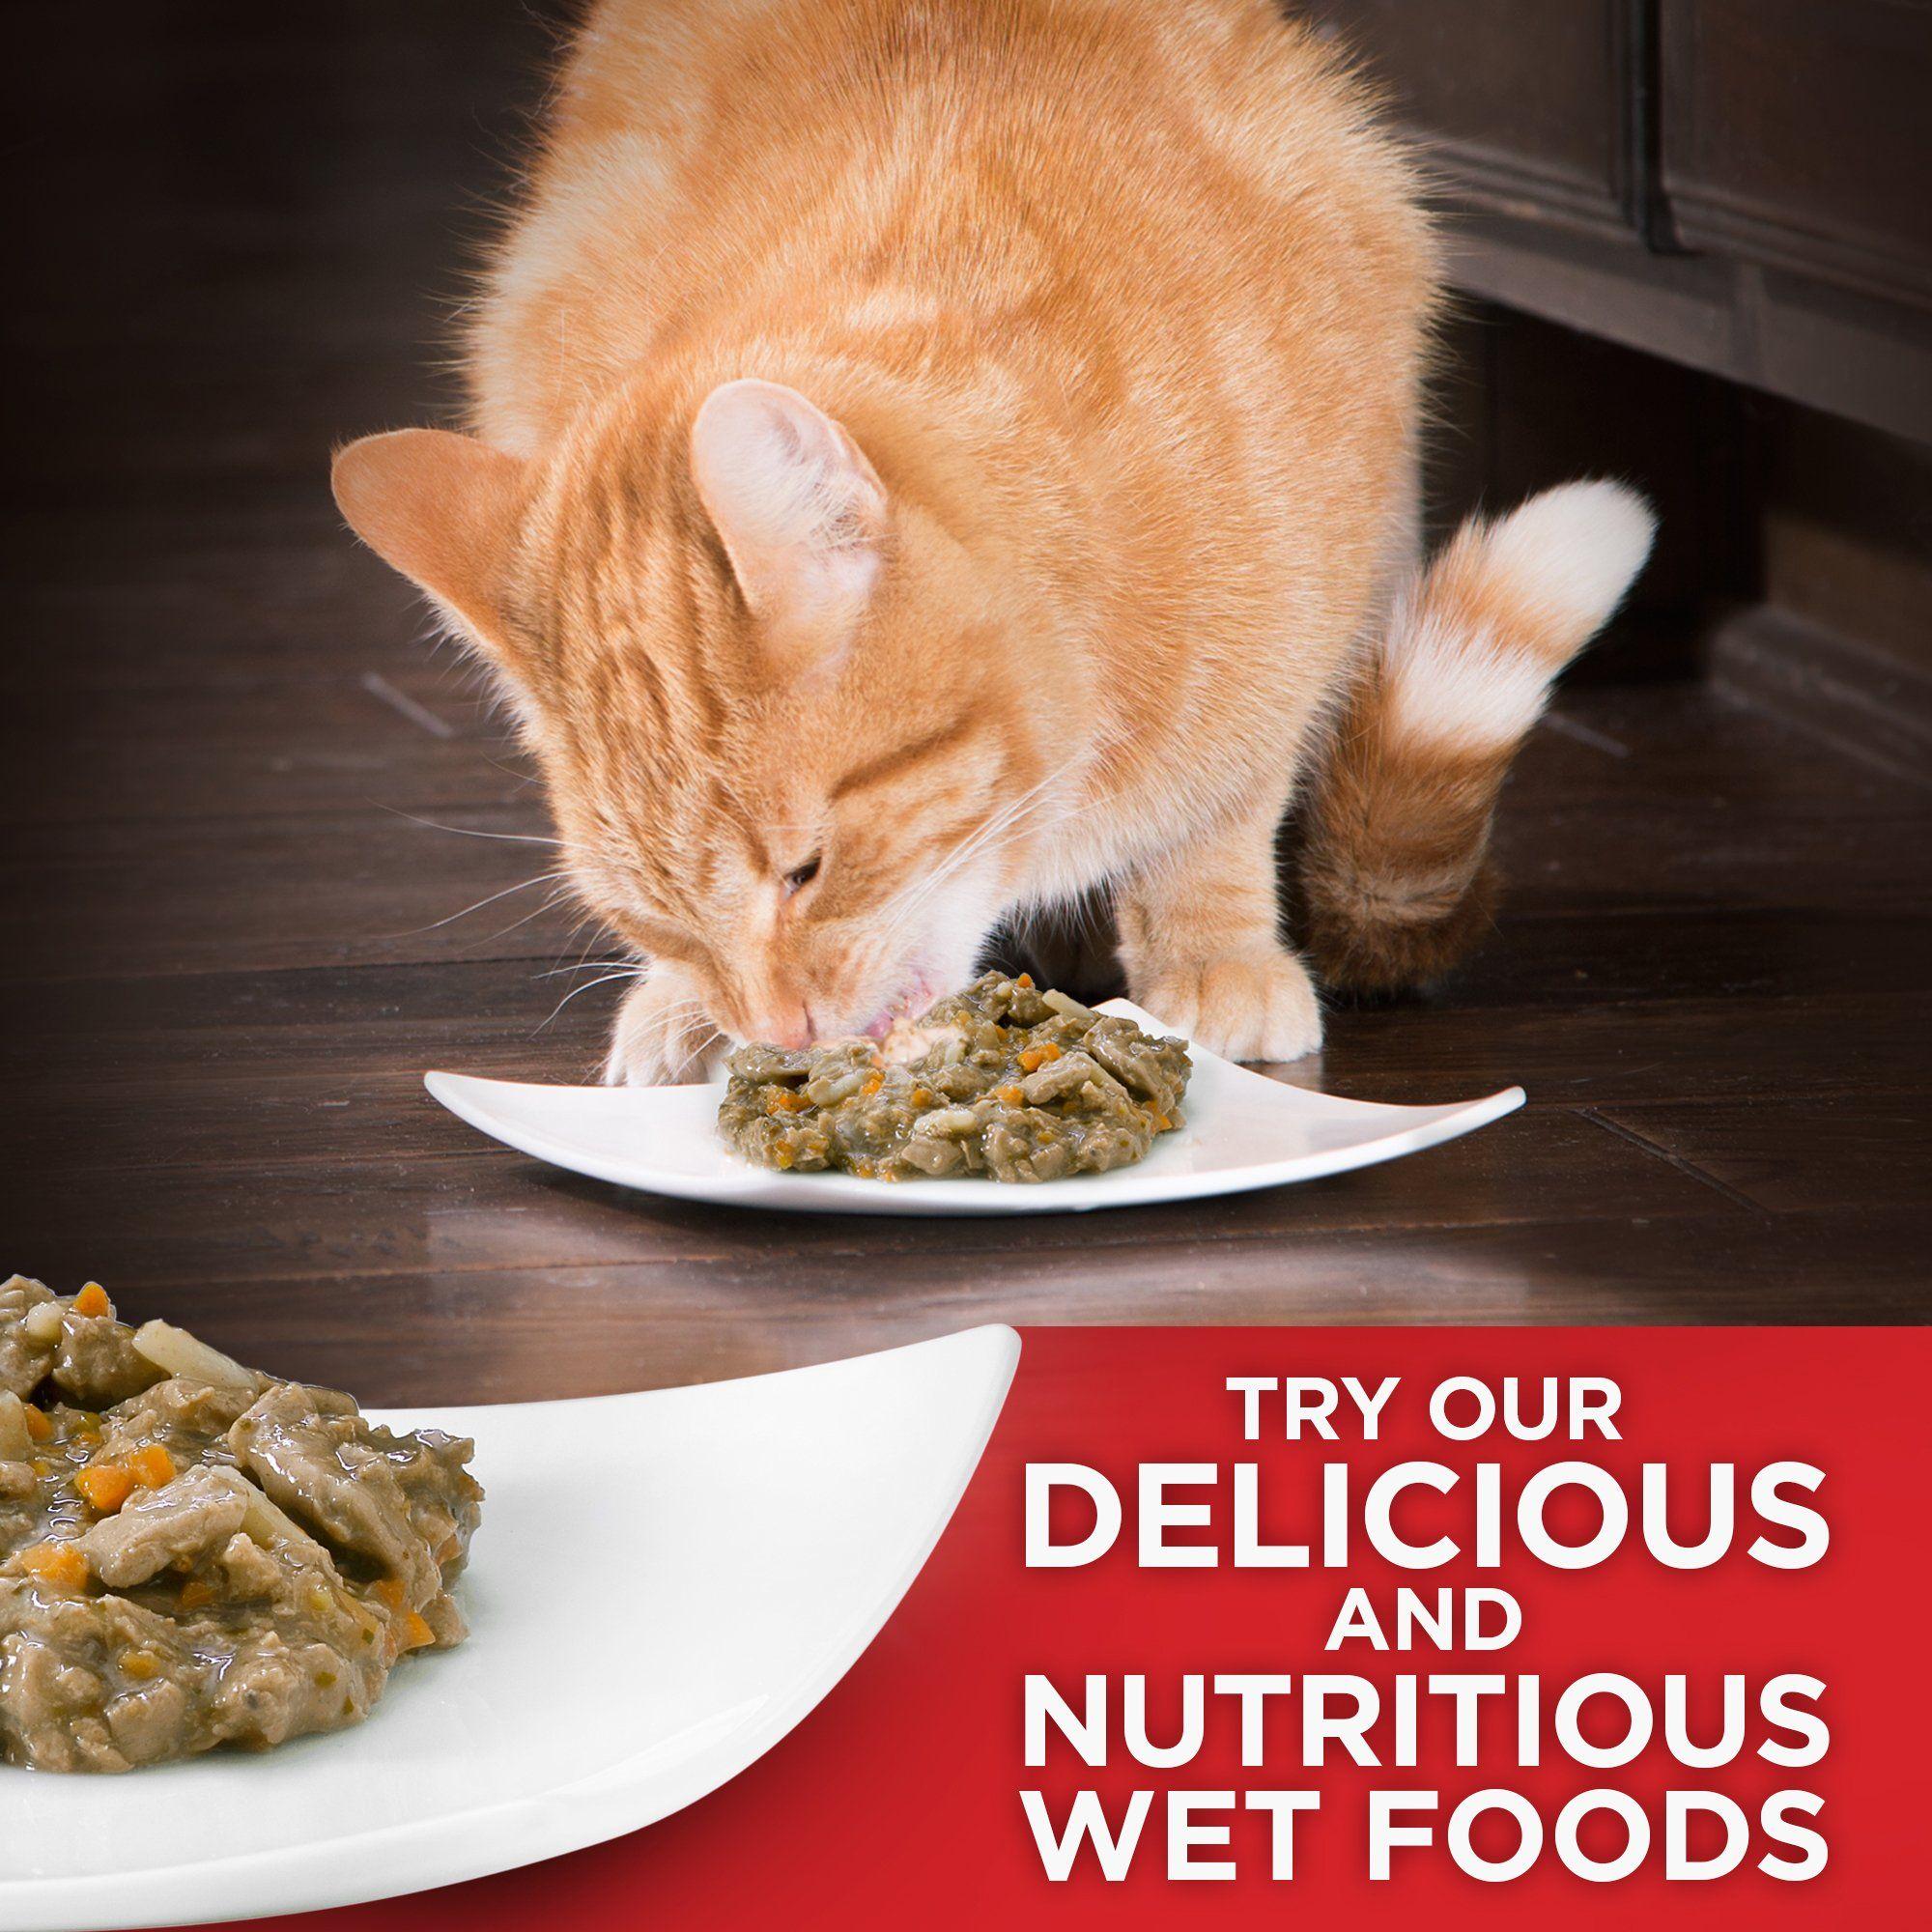 Hills Science Diet Kitten Food Healthy Development Chicken Recipe Dry Cat Food 7 Lb Bag Click Image For Mor Indoor Cat Food Dry Cat Food Hills Science Diet